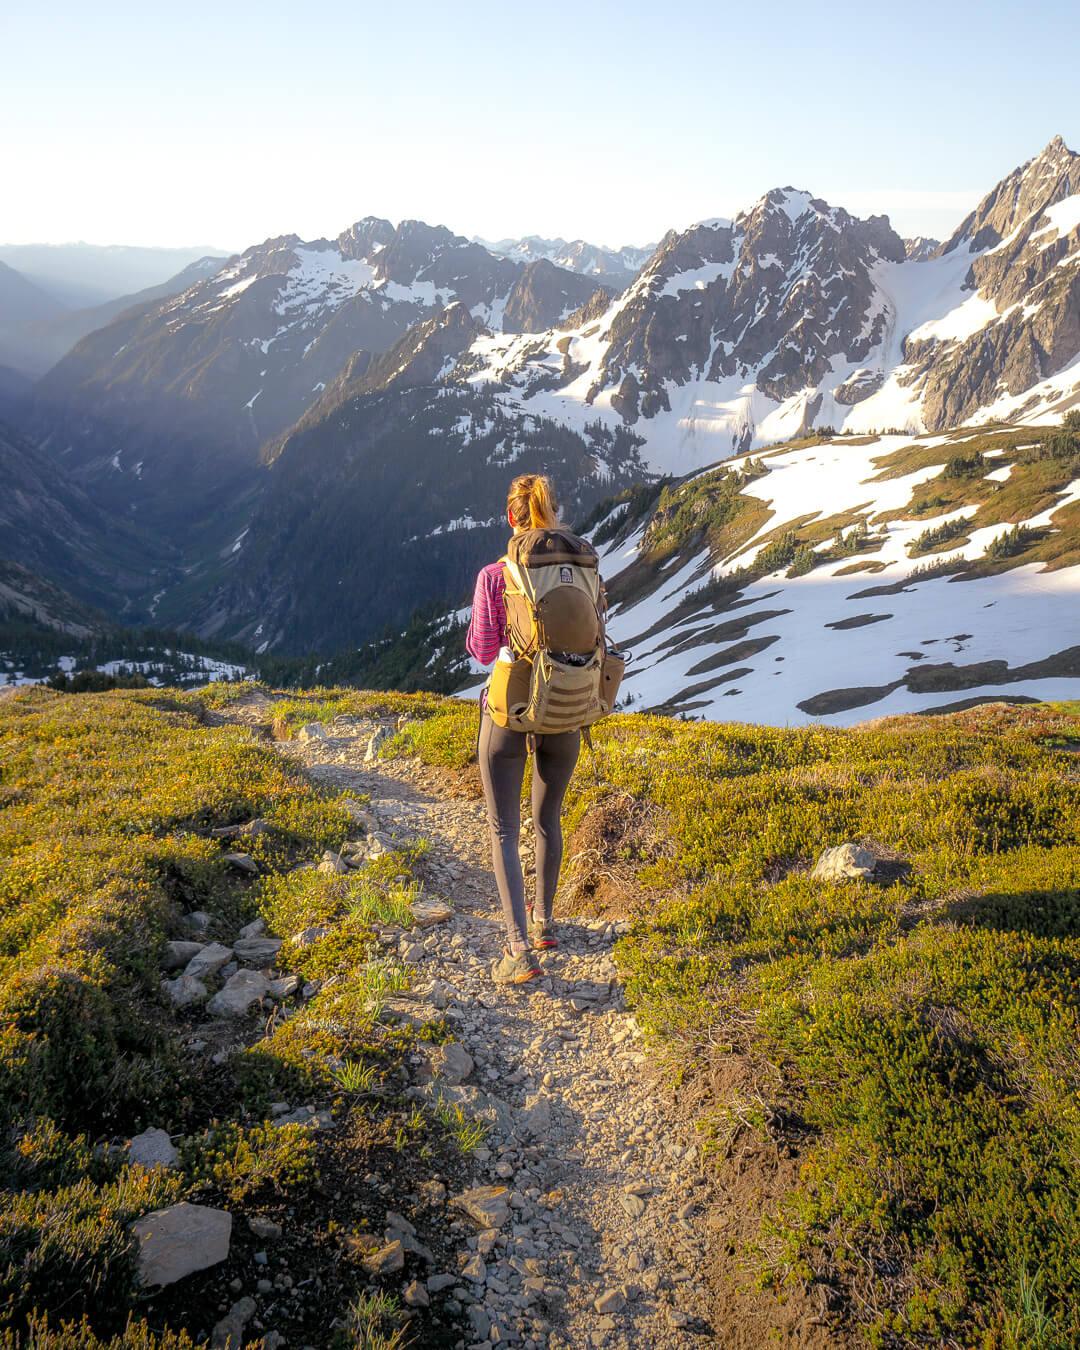 The hike up to Sahale Arm after Cascade Pass.